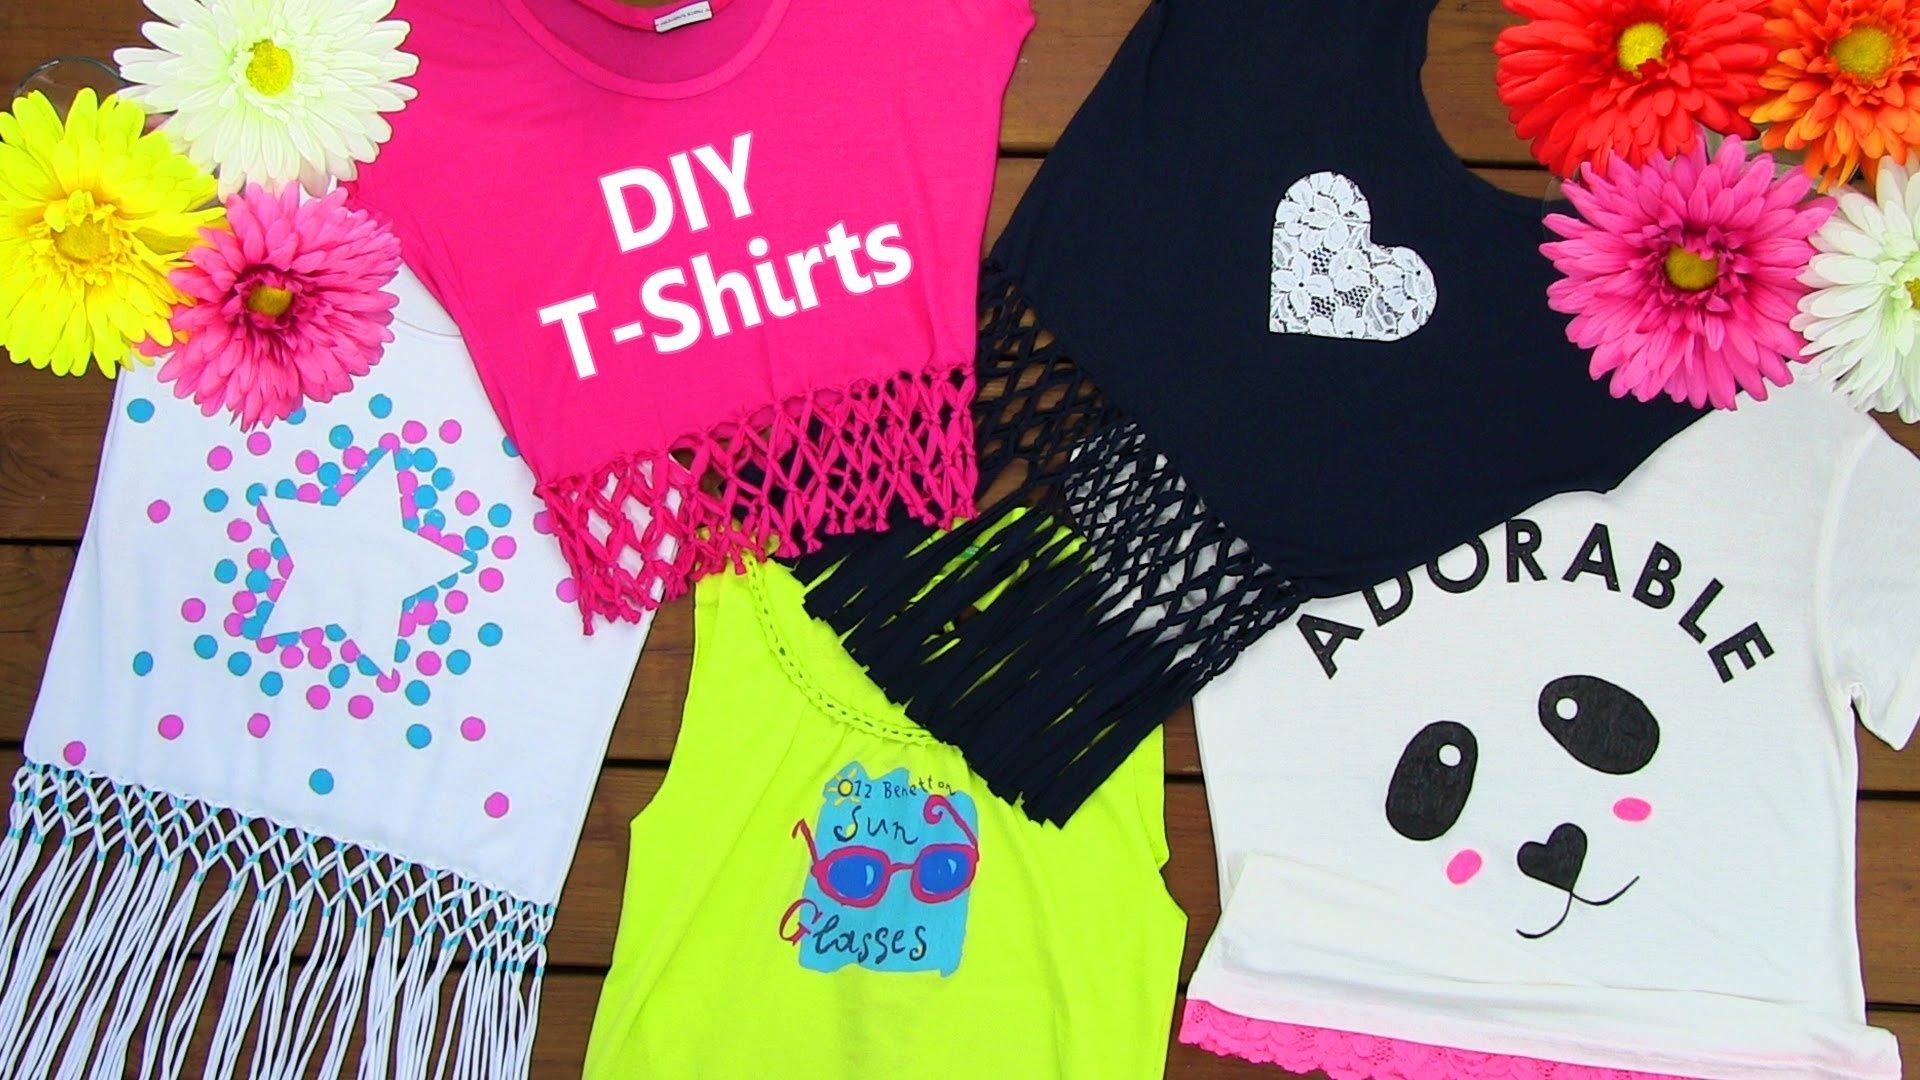 10 Gorgeous Diy T Shirt Design Ideas diy clothes diy 5 t shirt crafts t shirt cutting ideas and 2020